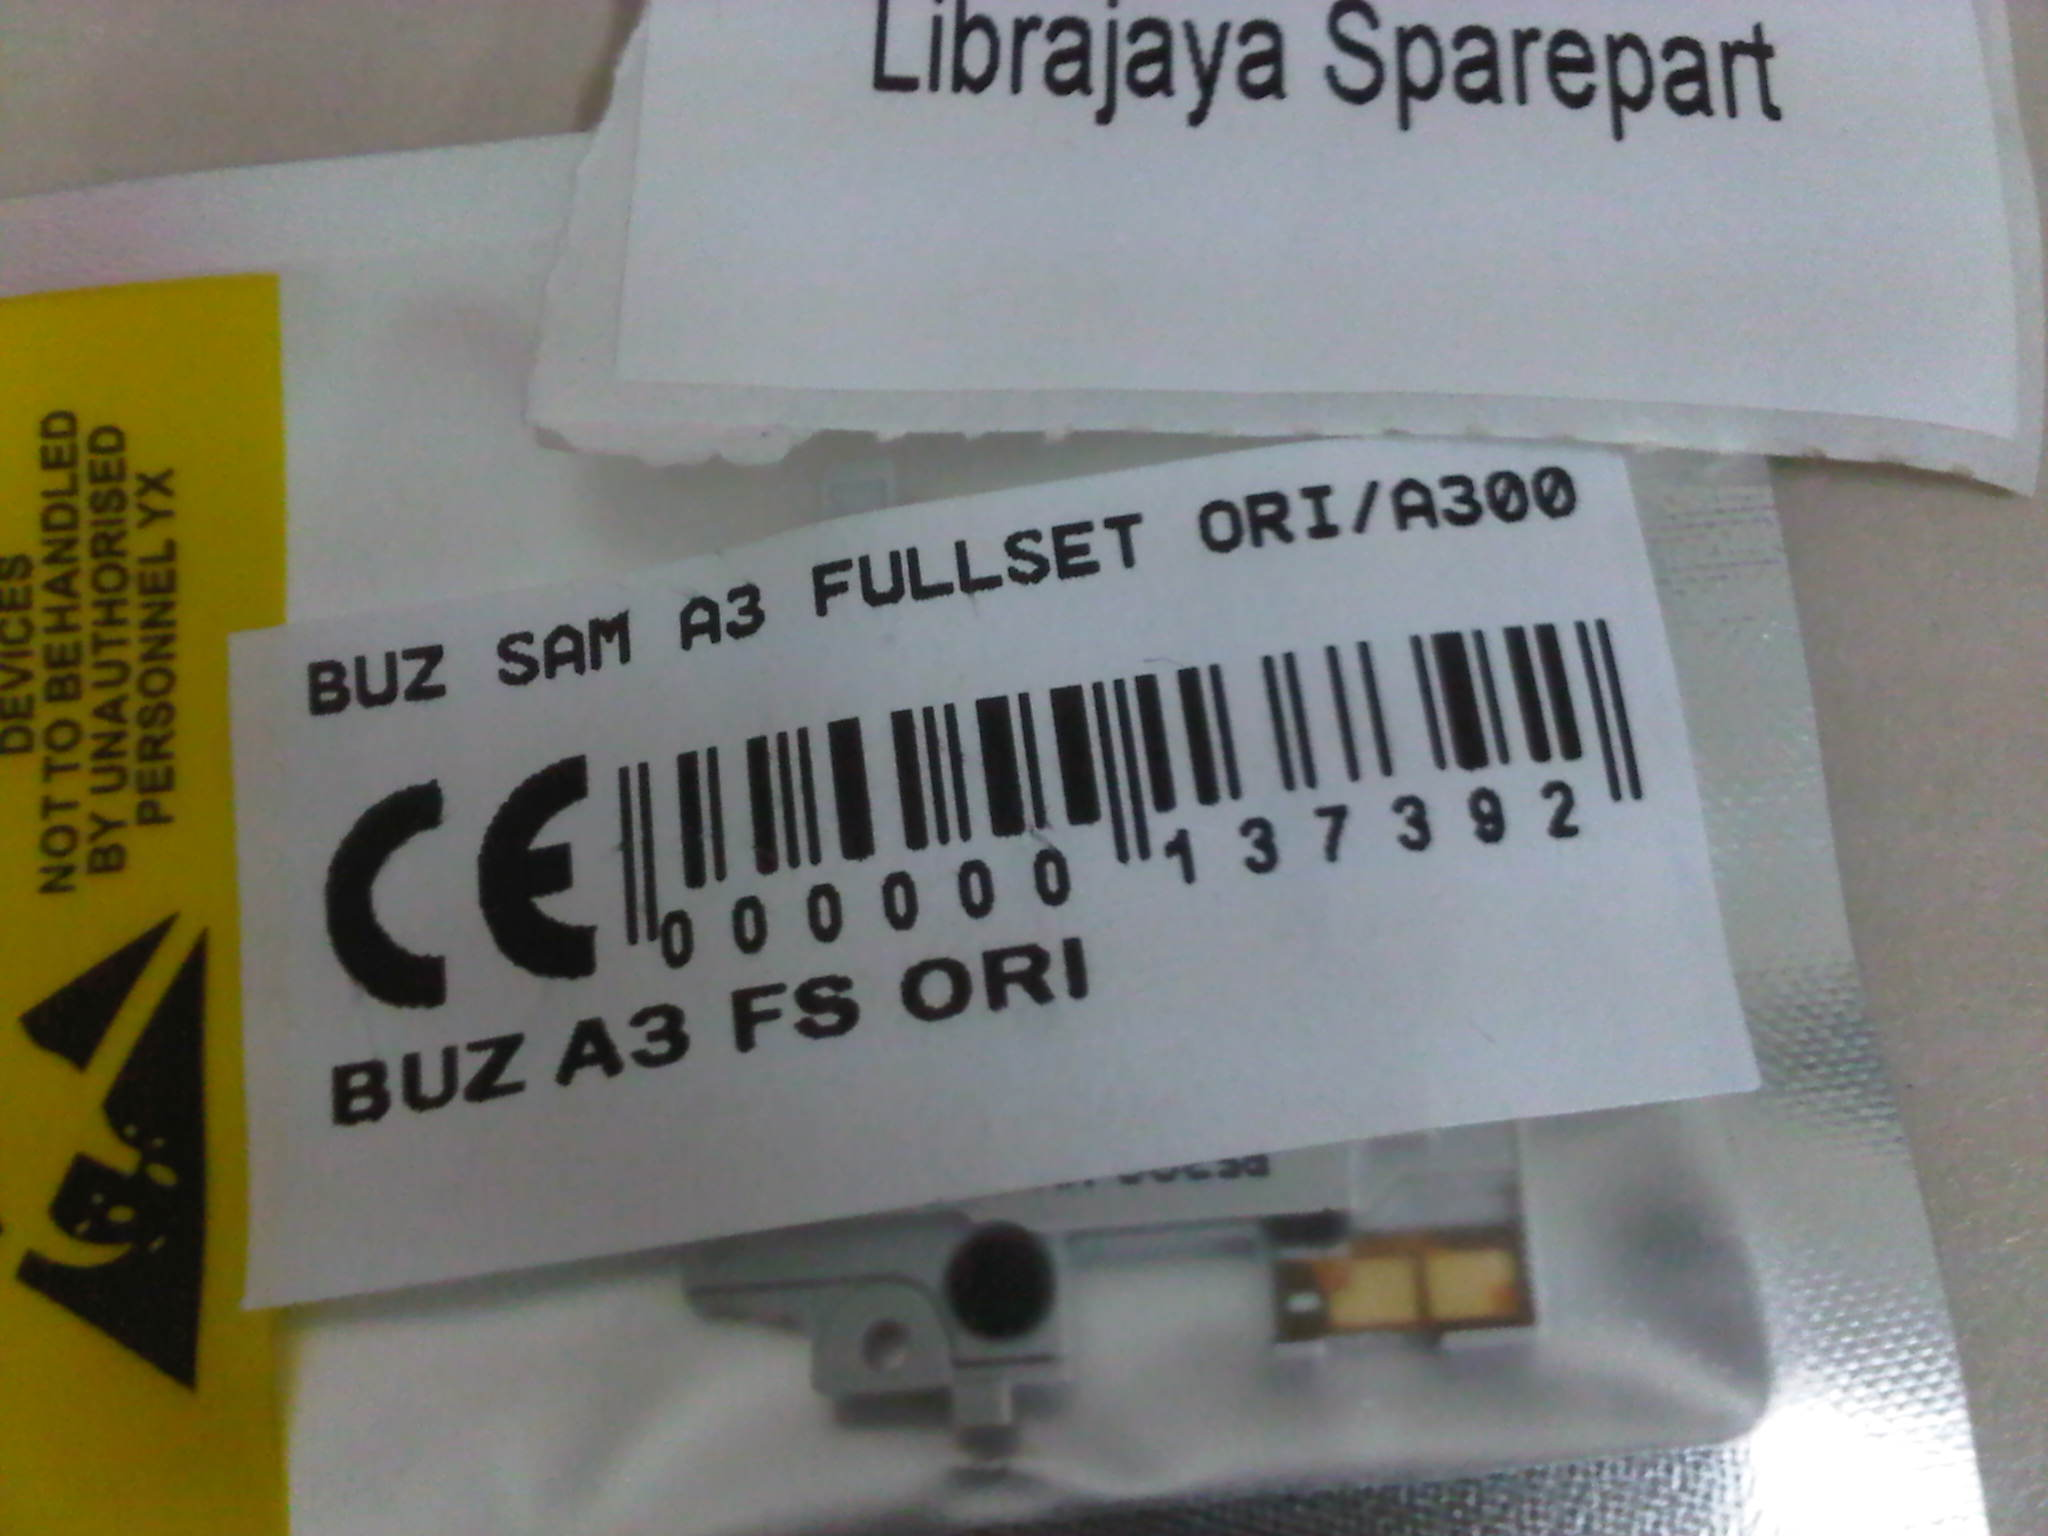 Buzzer Samsung A3 Fullset Librajaya Grosir Sparepart Hp Murah Lcd E1272 Ui Caramel